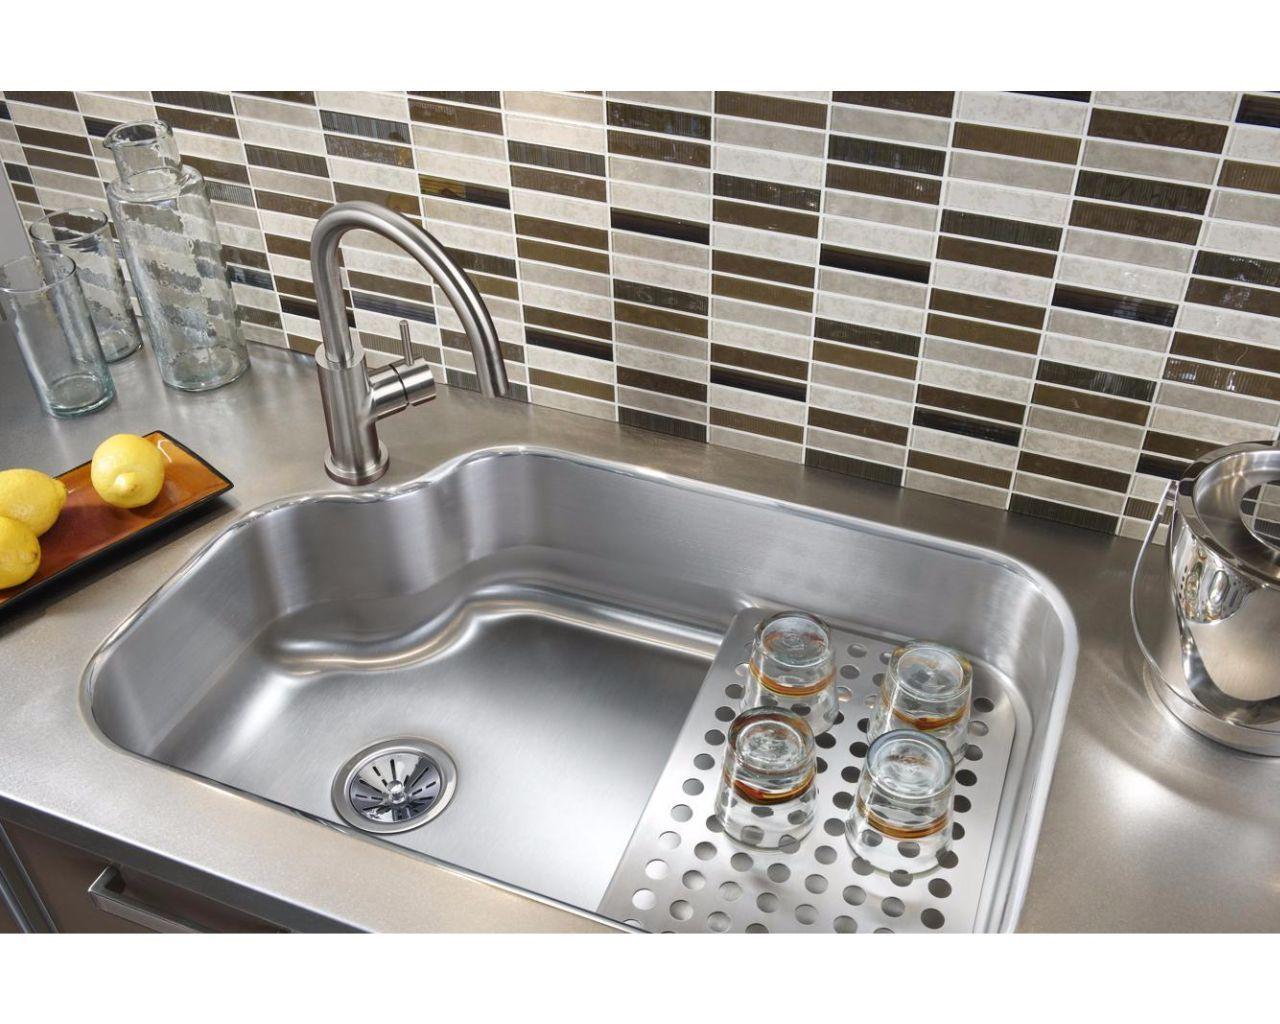 Elkay Lustertone Stainless Steel 32 X 21 X 8 Single Bowl Undermount Sink Kit Mystic3021bg Elkay C Kitchen Sink Remodel Kitchen Sink Design Kitchen Remodel